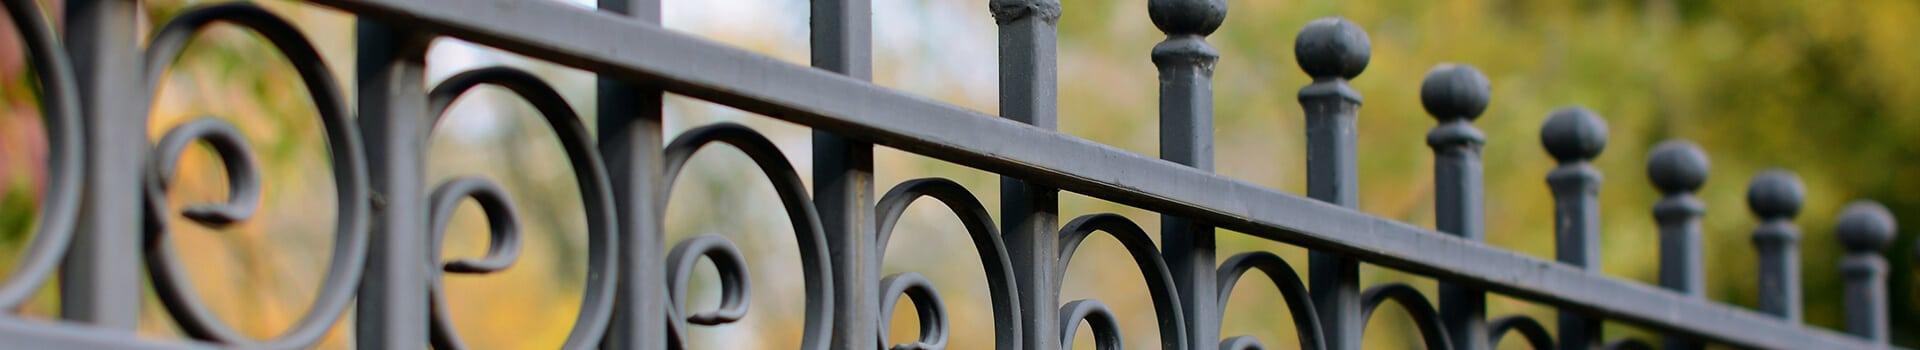 Aluminum Fence Type